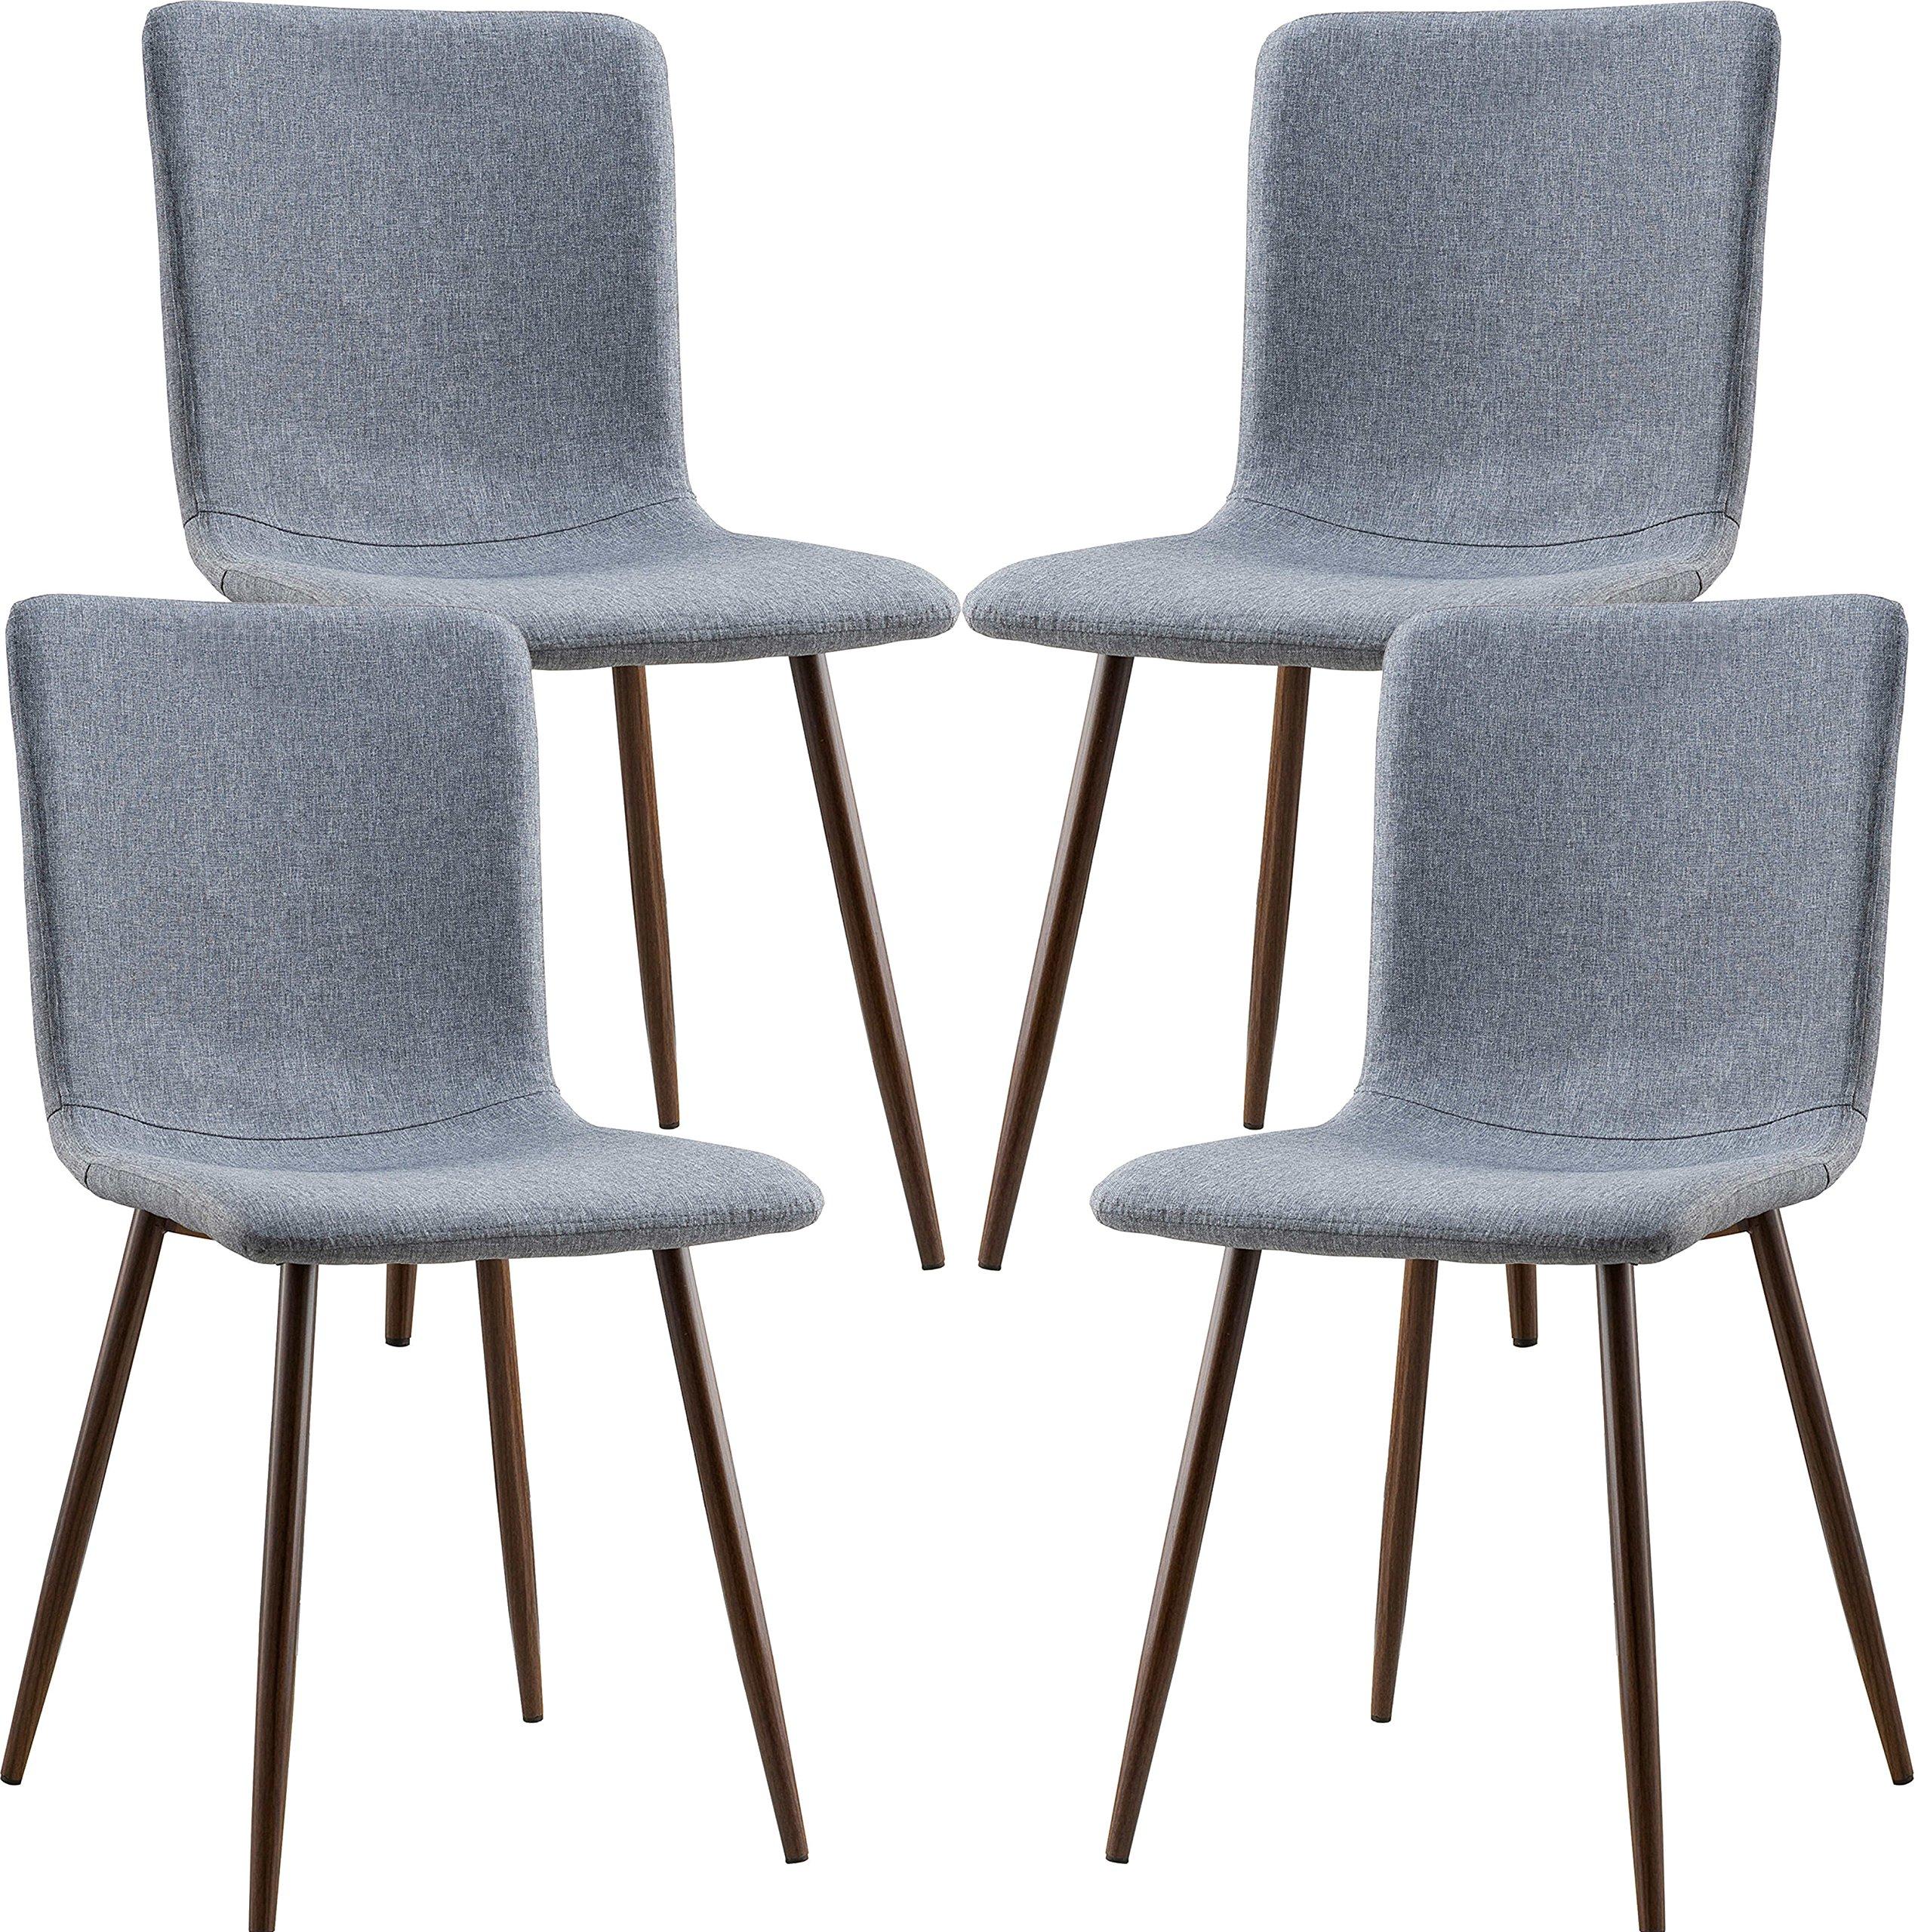 POLY & BARK EM-287-GRY-X4-A Wadsworth Dining Chair with Walnut Legs, Set of 4,